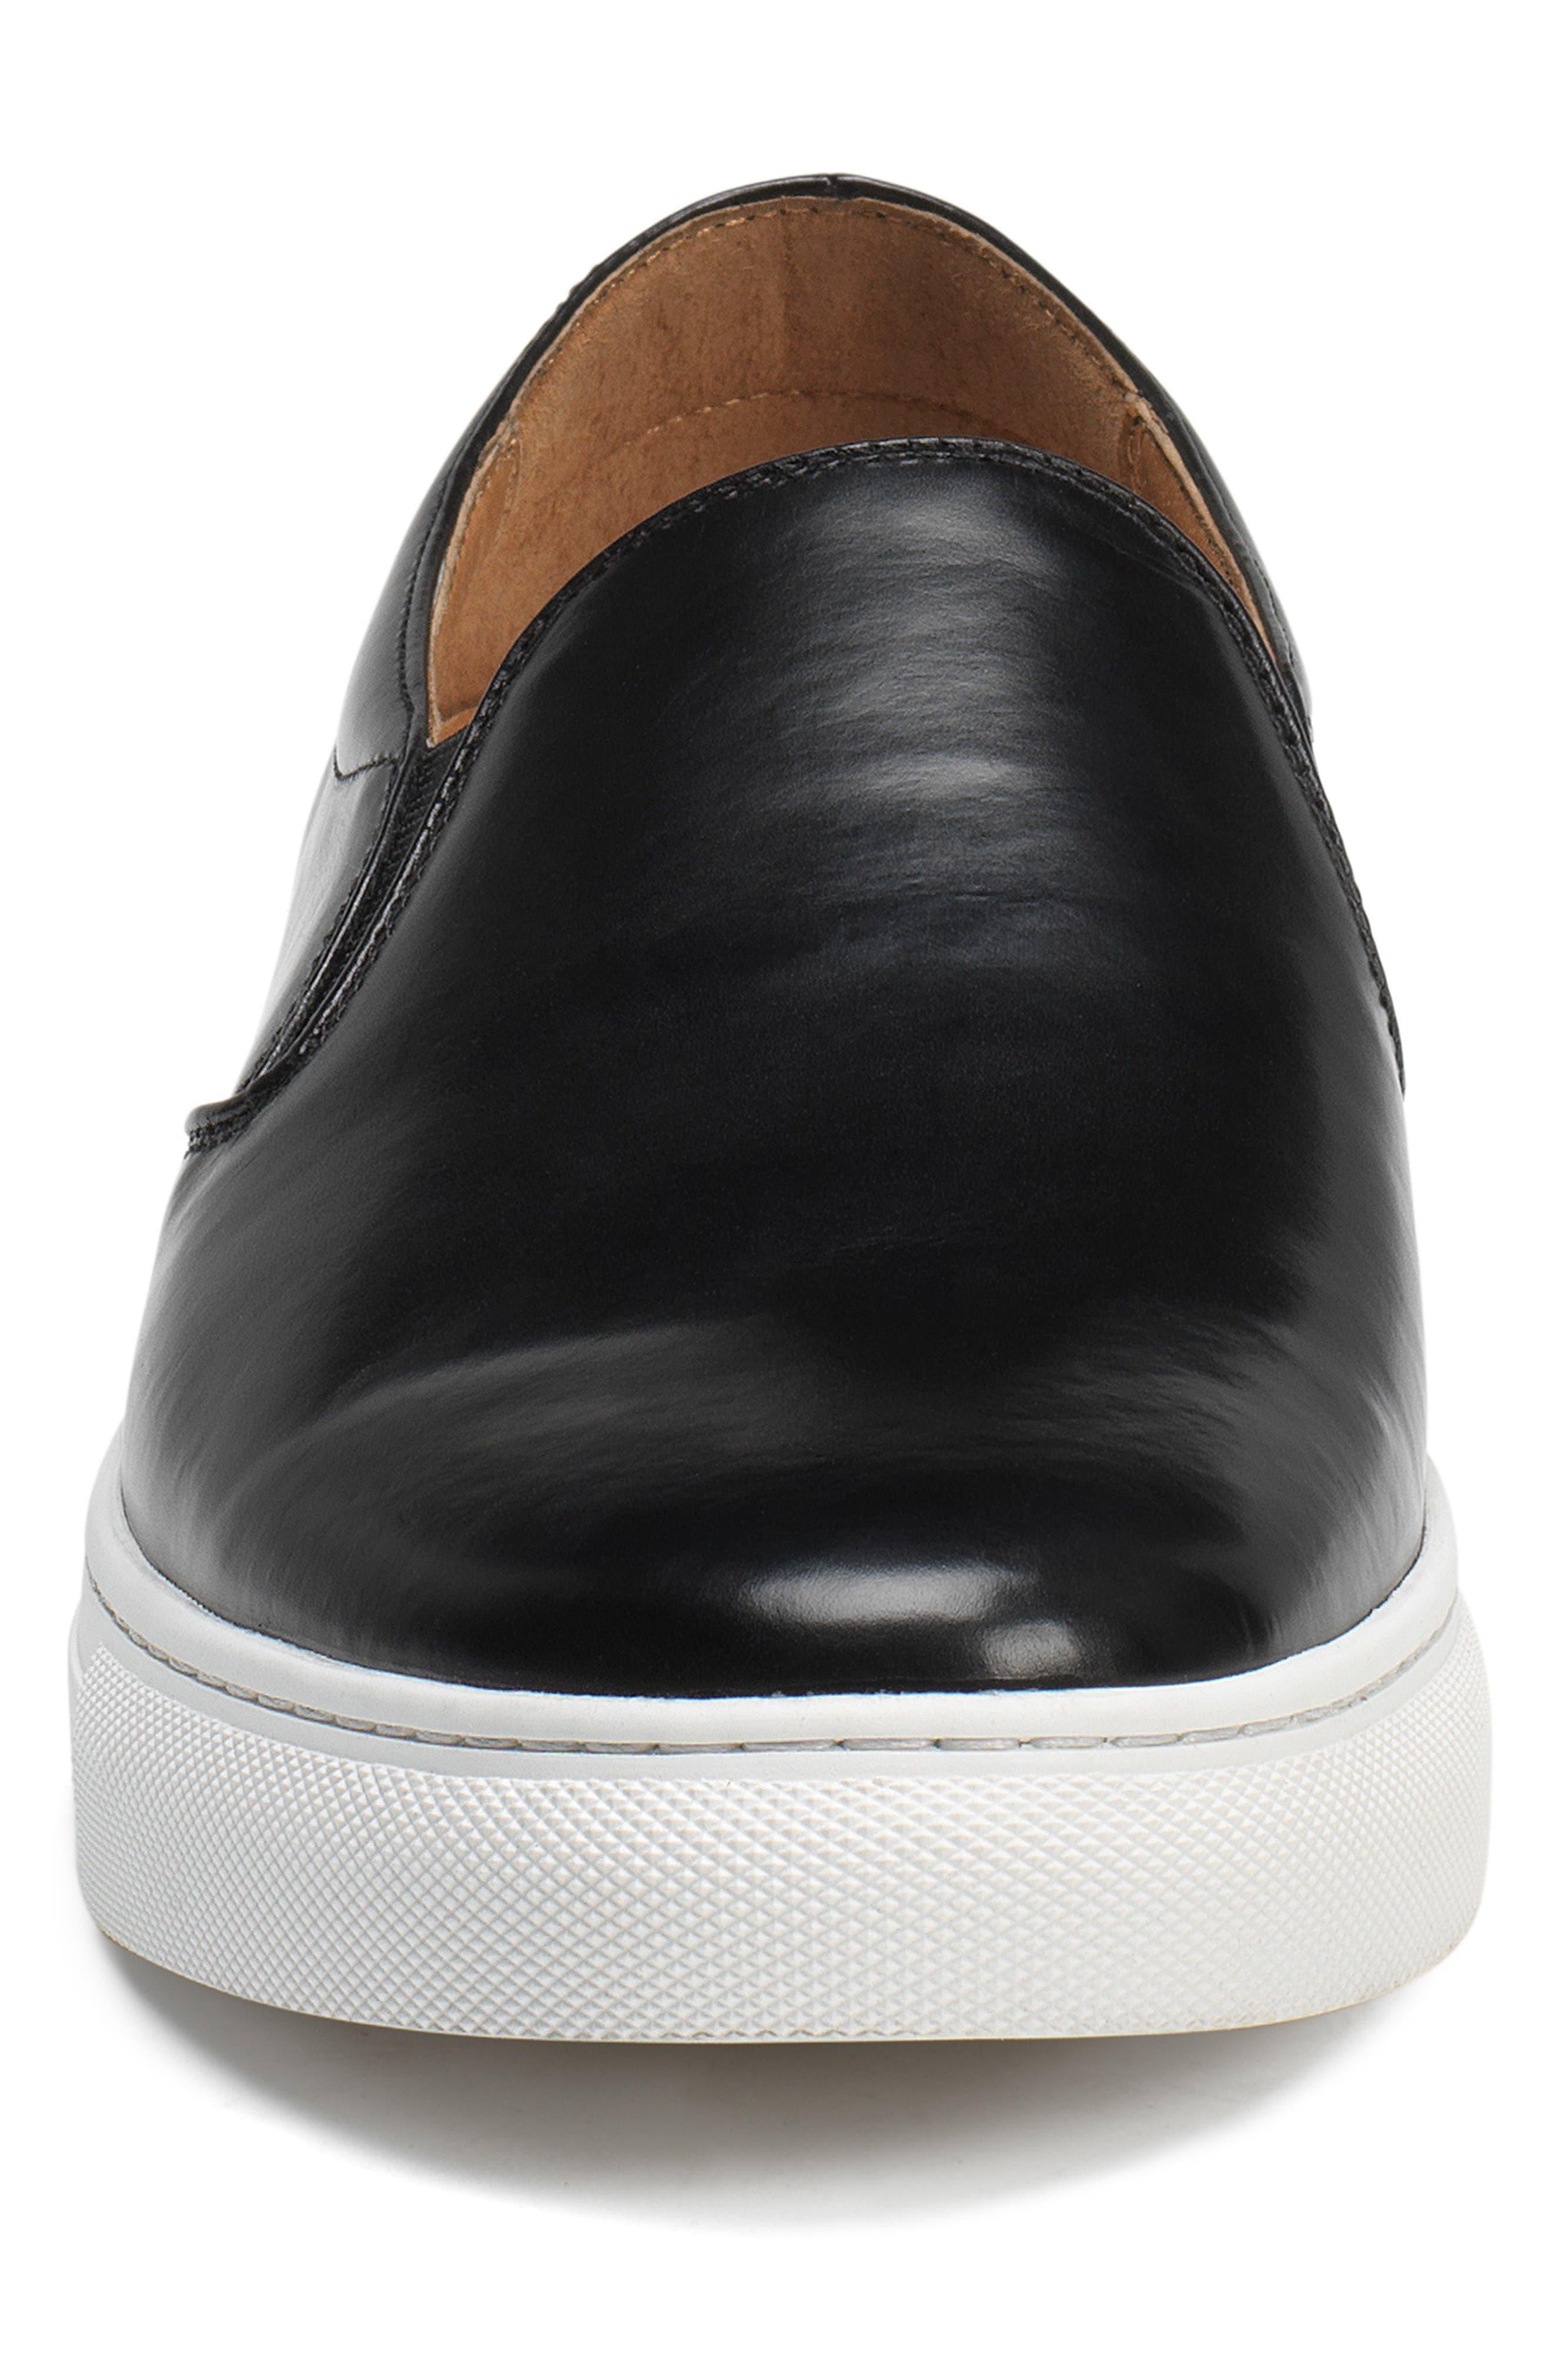 Alex Slip-On Sneaker,                             Alternate thumbnail 4, color,                             Black Leather